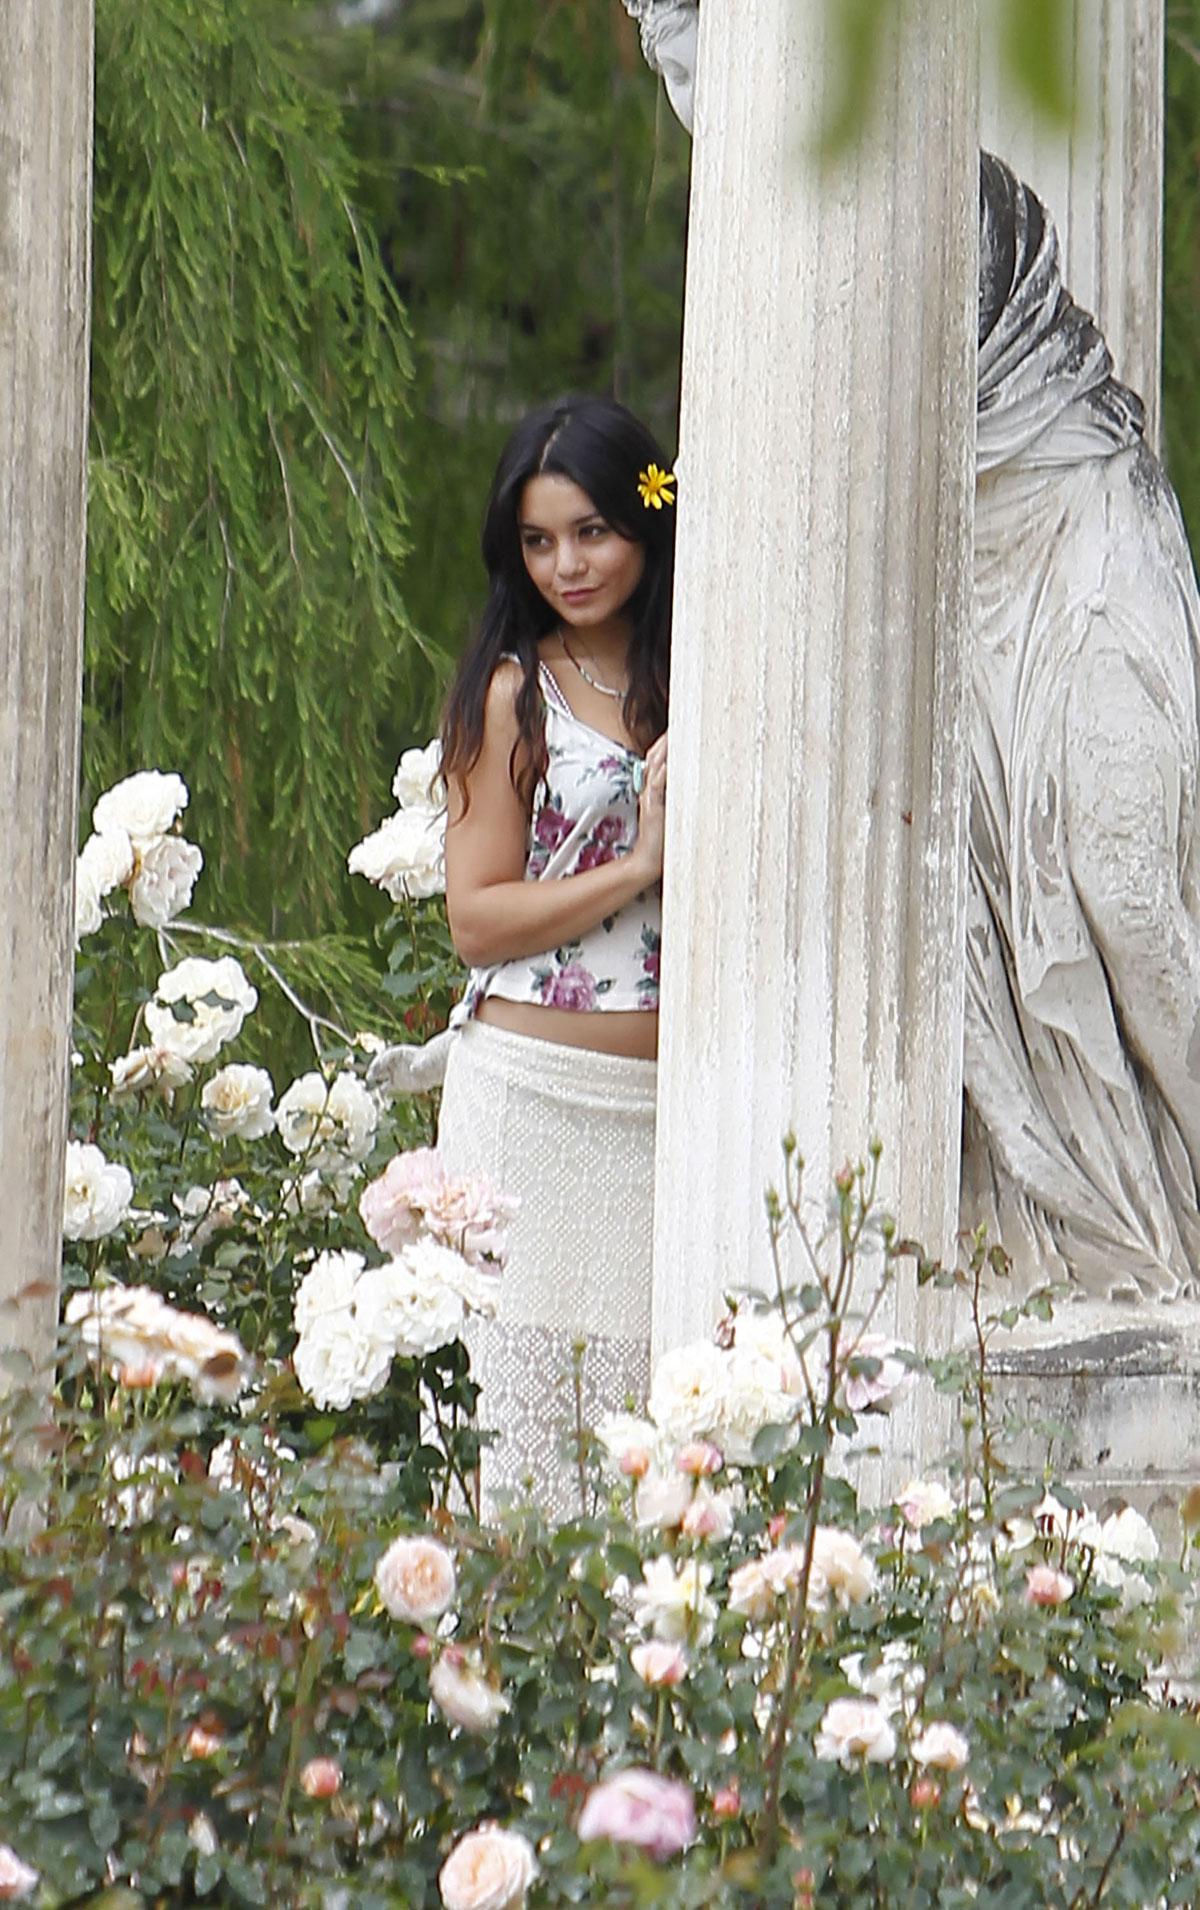 Vanessa Hudgens At The Huntington Library Botanical Gardens In San